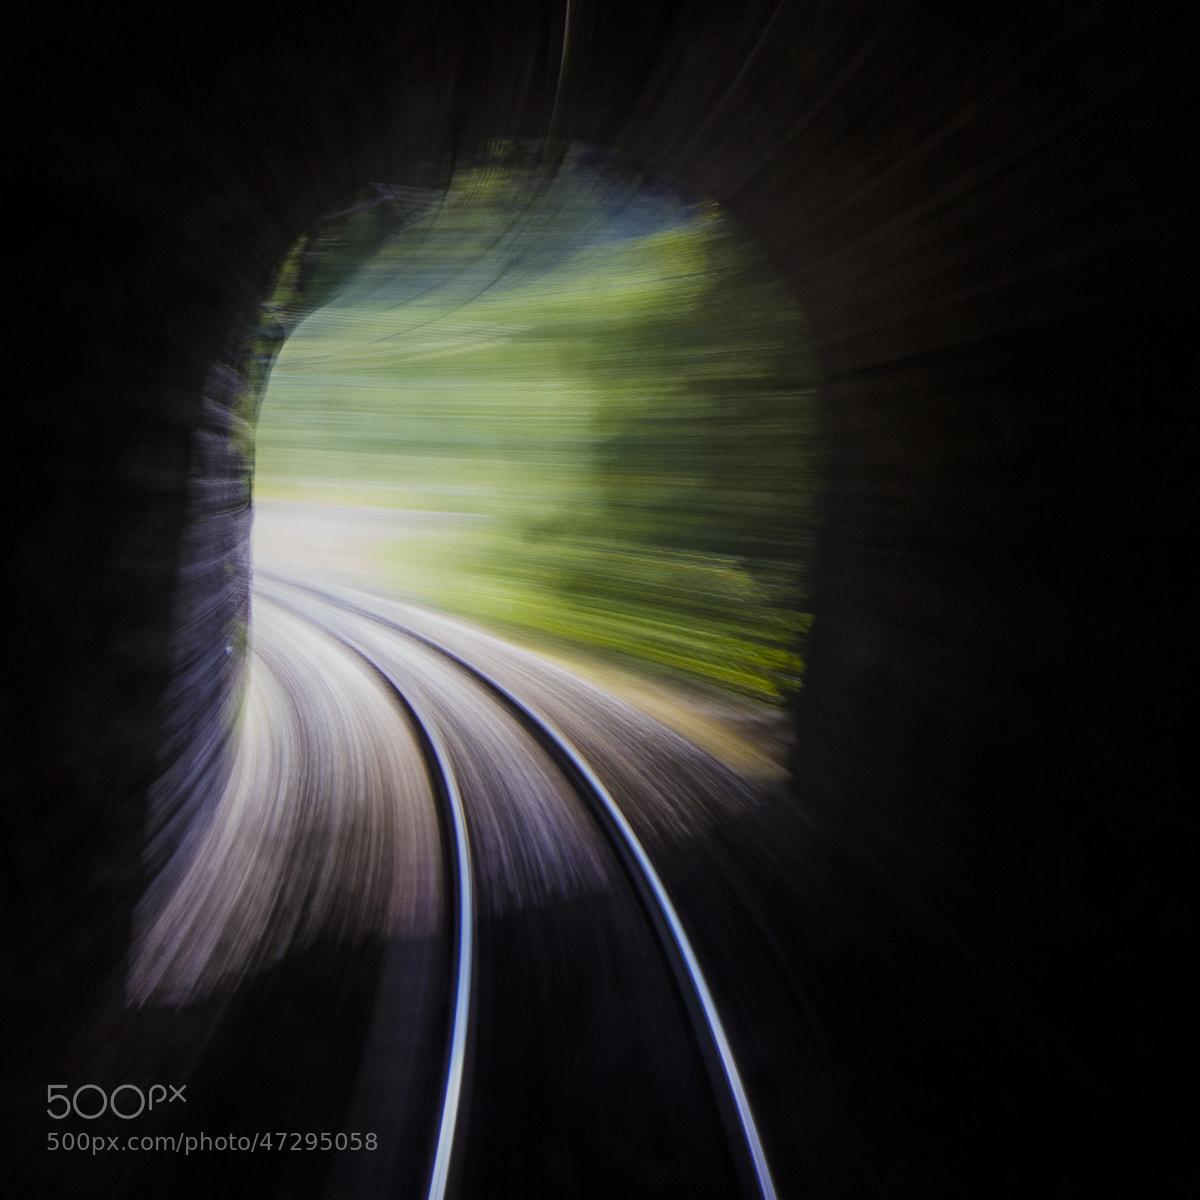 Photograph Au bout du tunnel by Alexandre Lachausse on 500px